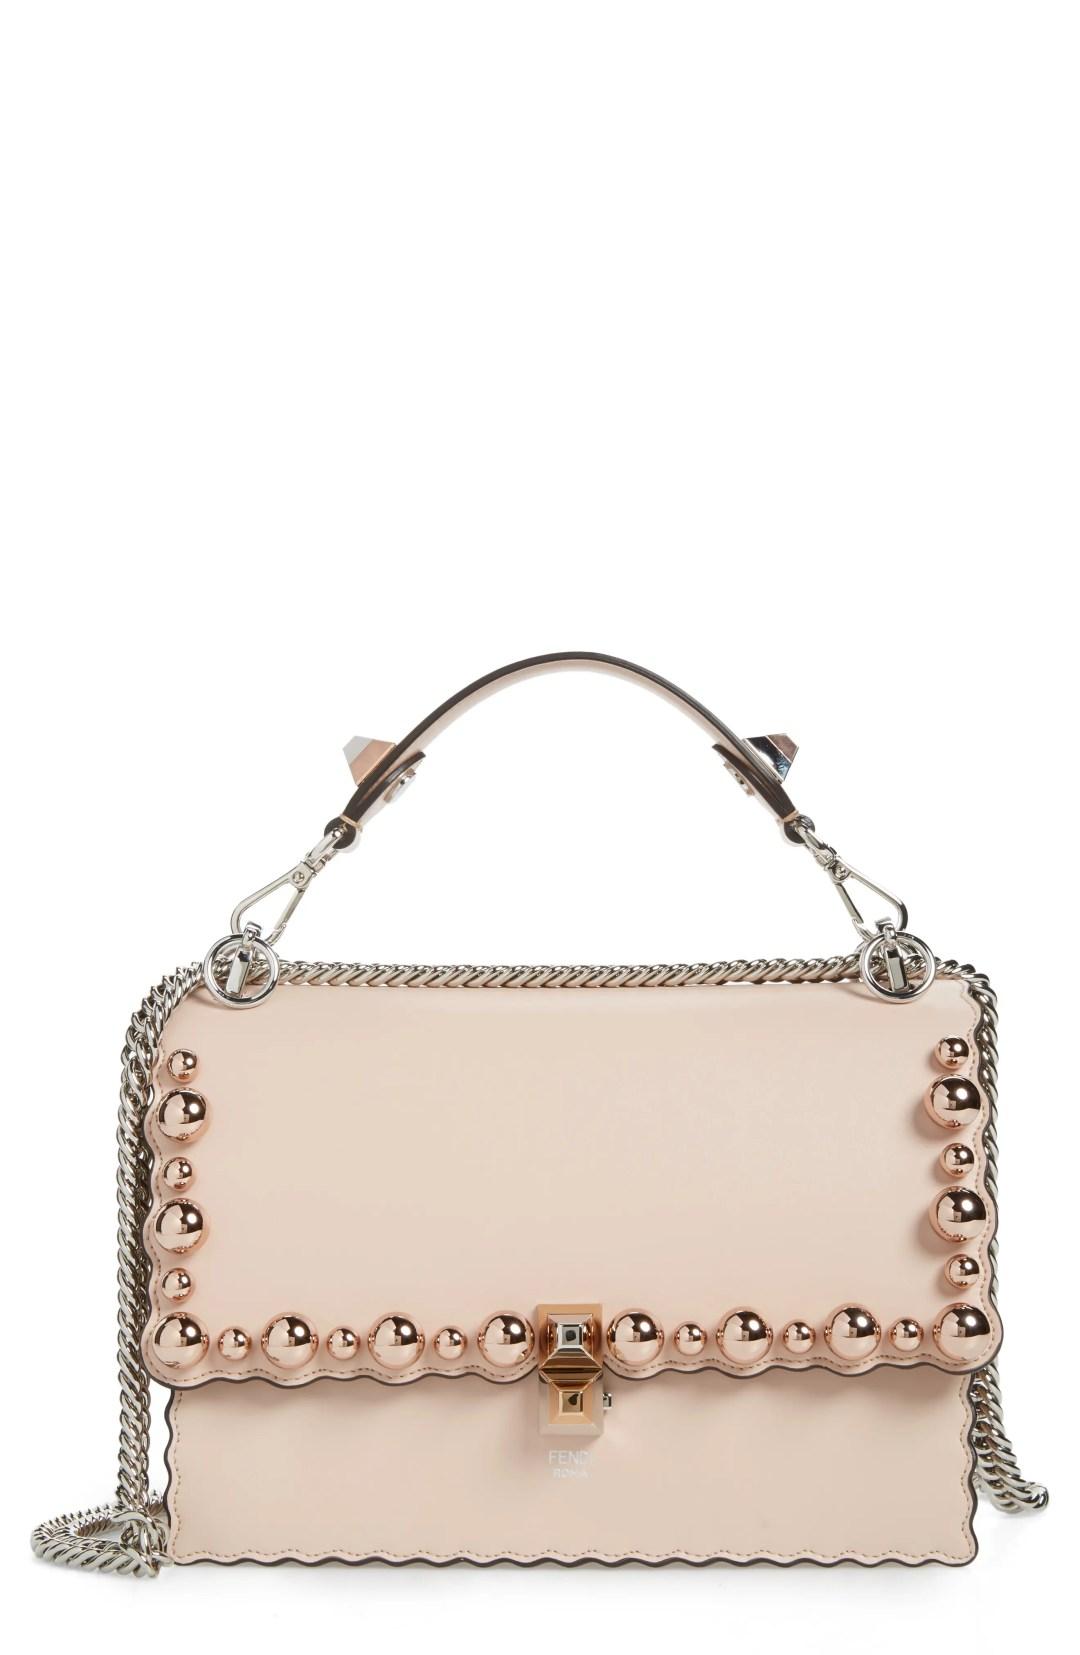 40be90ee4 Fendi Mini Kan I Imitation Pearl Scallop Leather Shoulder Bag – –  NORDSTROM.com – $3,190.00